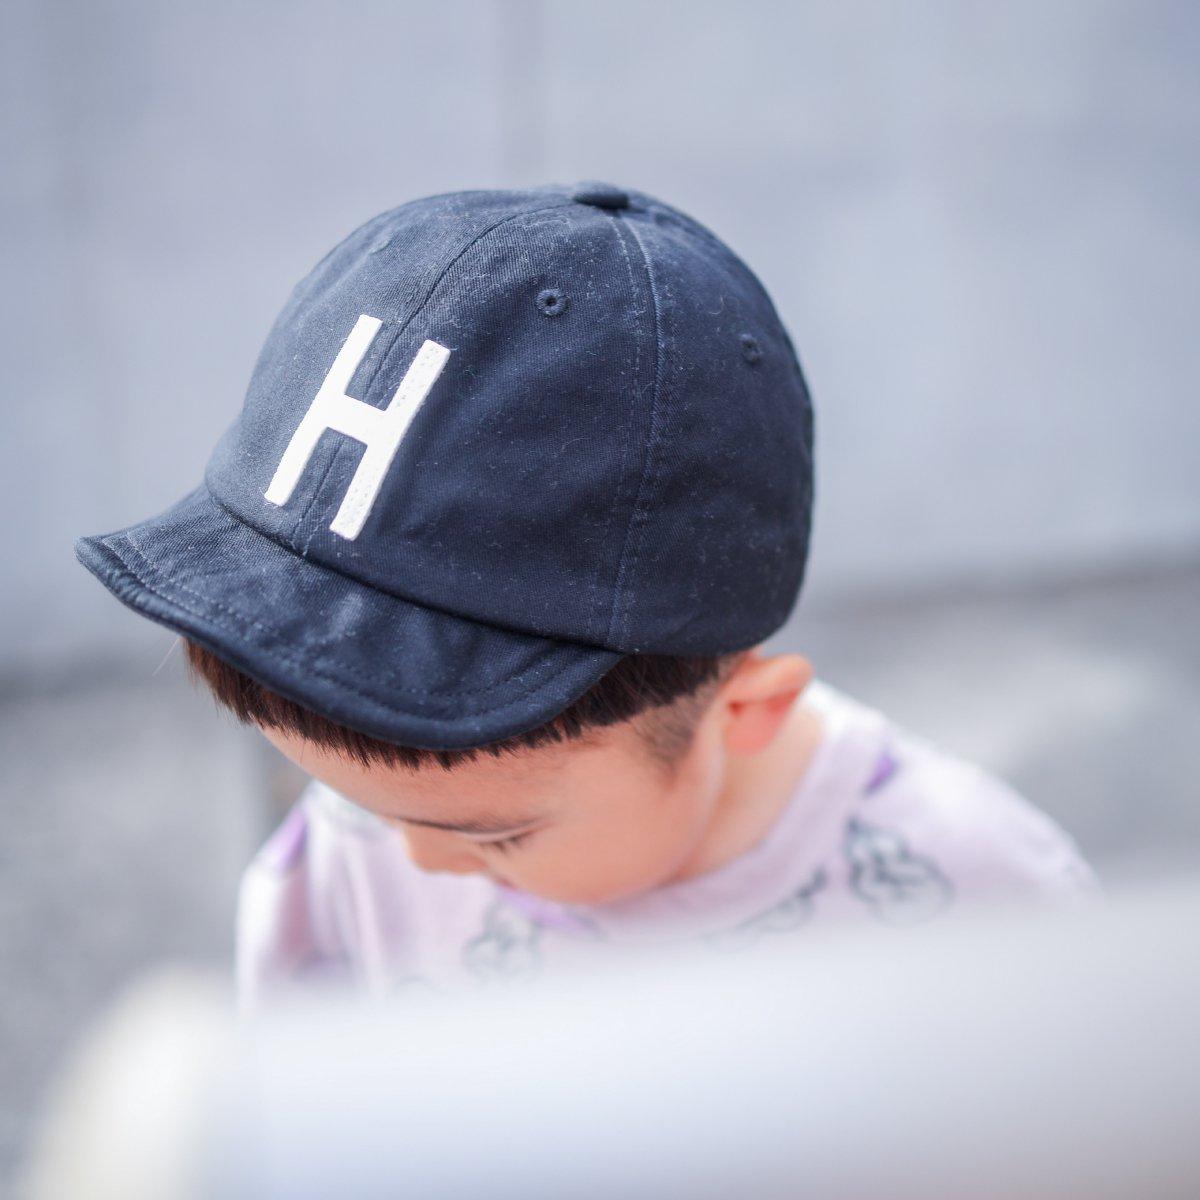 【KIDS】Kids Sim Logo Cap 詳細画像43